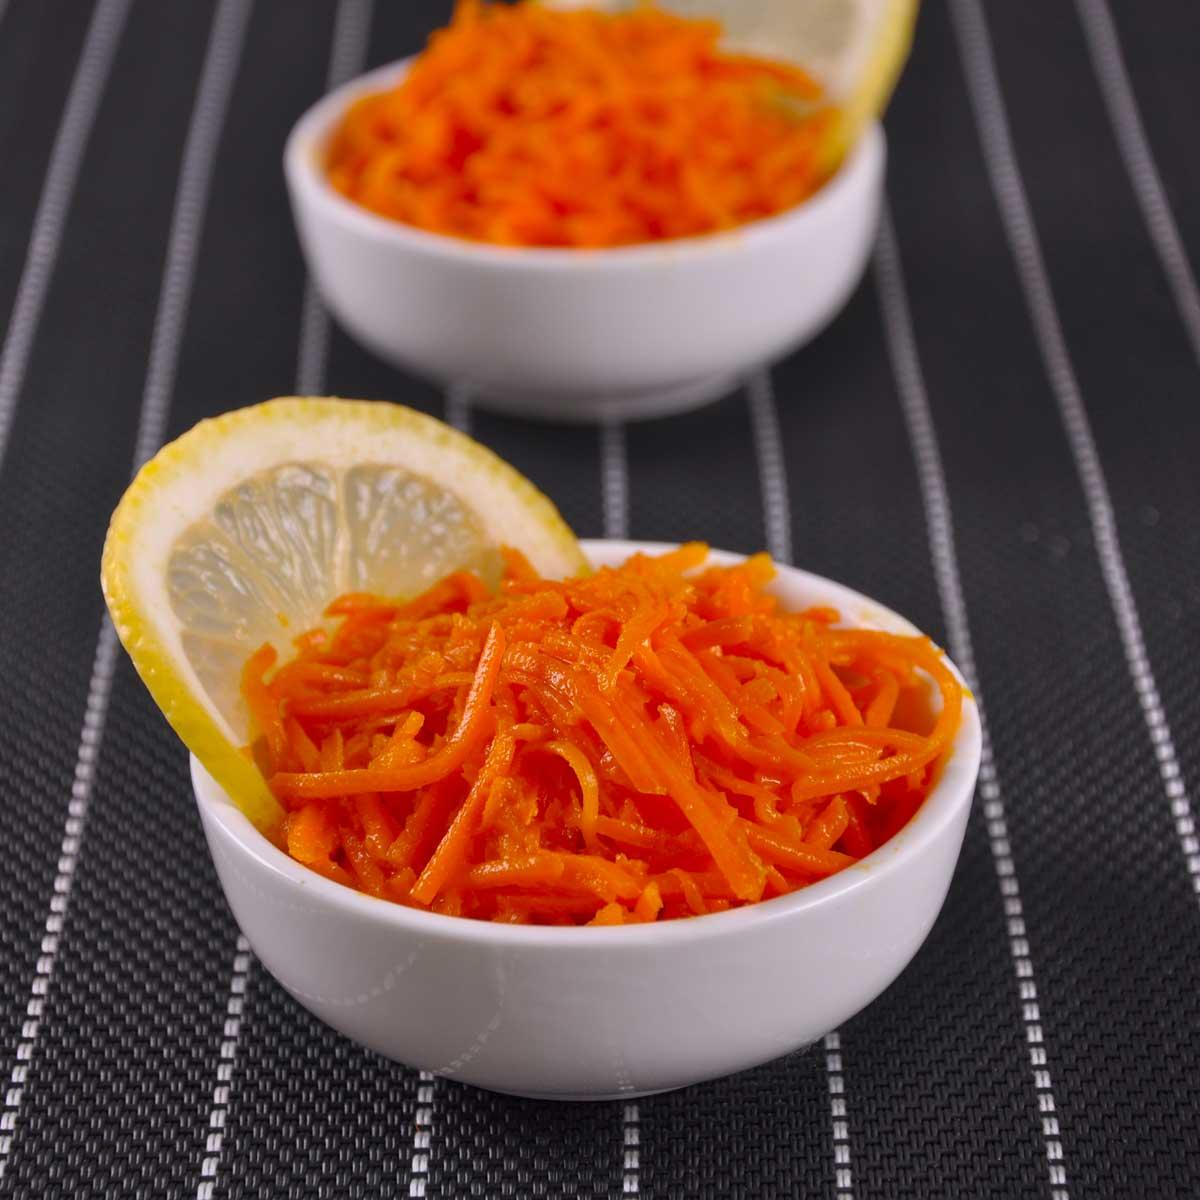 recette salade de carottes r p es au citron cuisine madame figaro. Black Bedroom Furniture Sets. Home Design Ideas